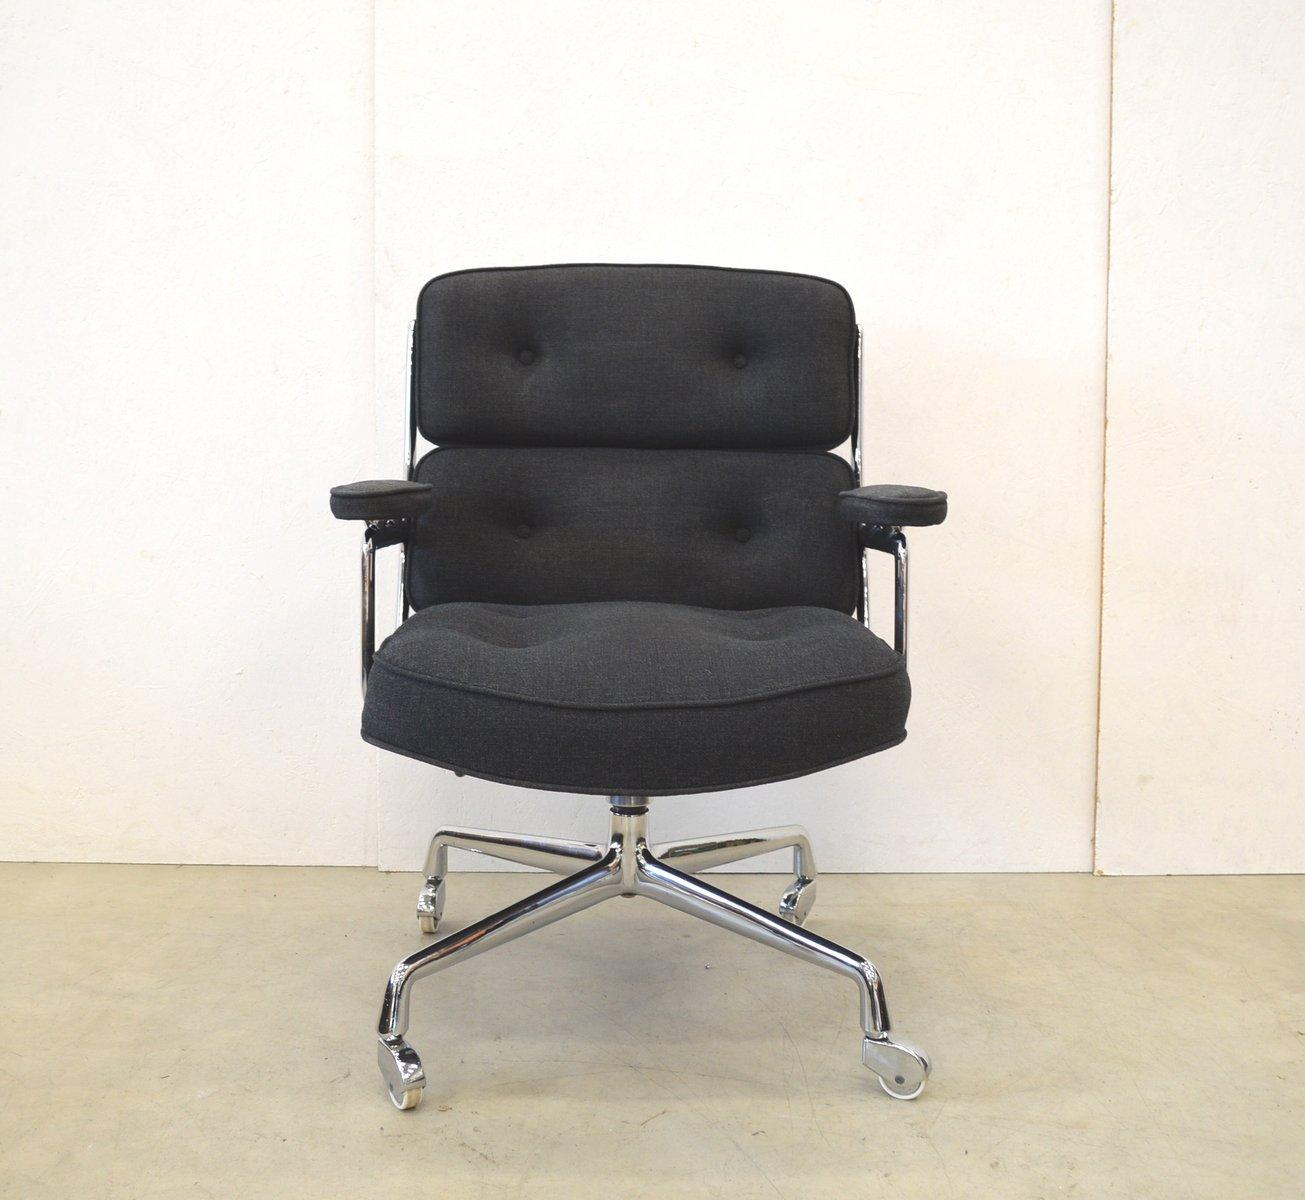 amerikanischer modell es104 b rostuhl von charles ray eames f r herman miller 1970er bei. Black Bedroom Furniture Sets. Home Design Ideas